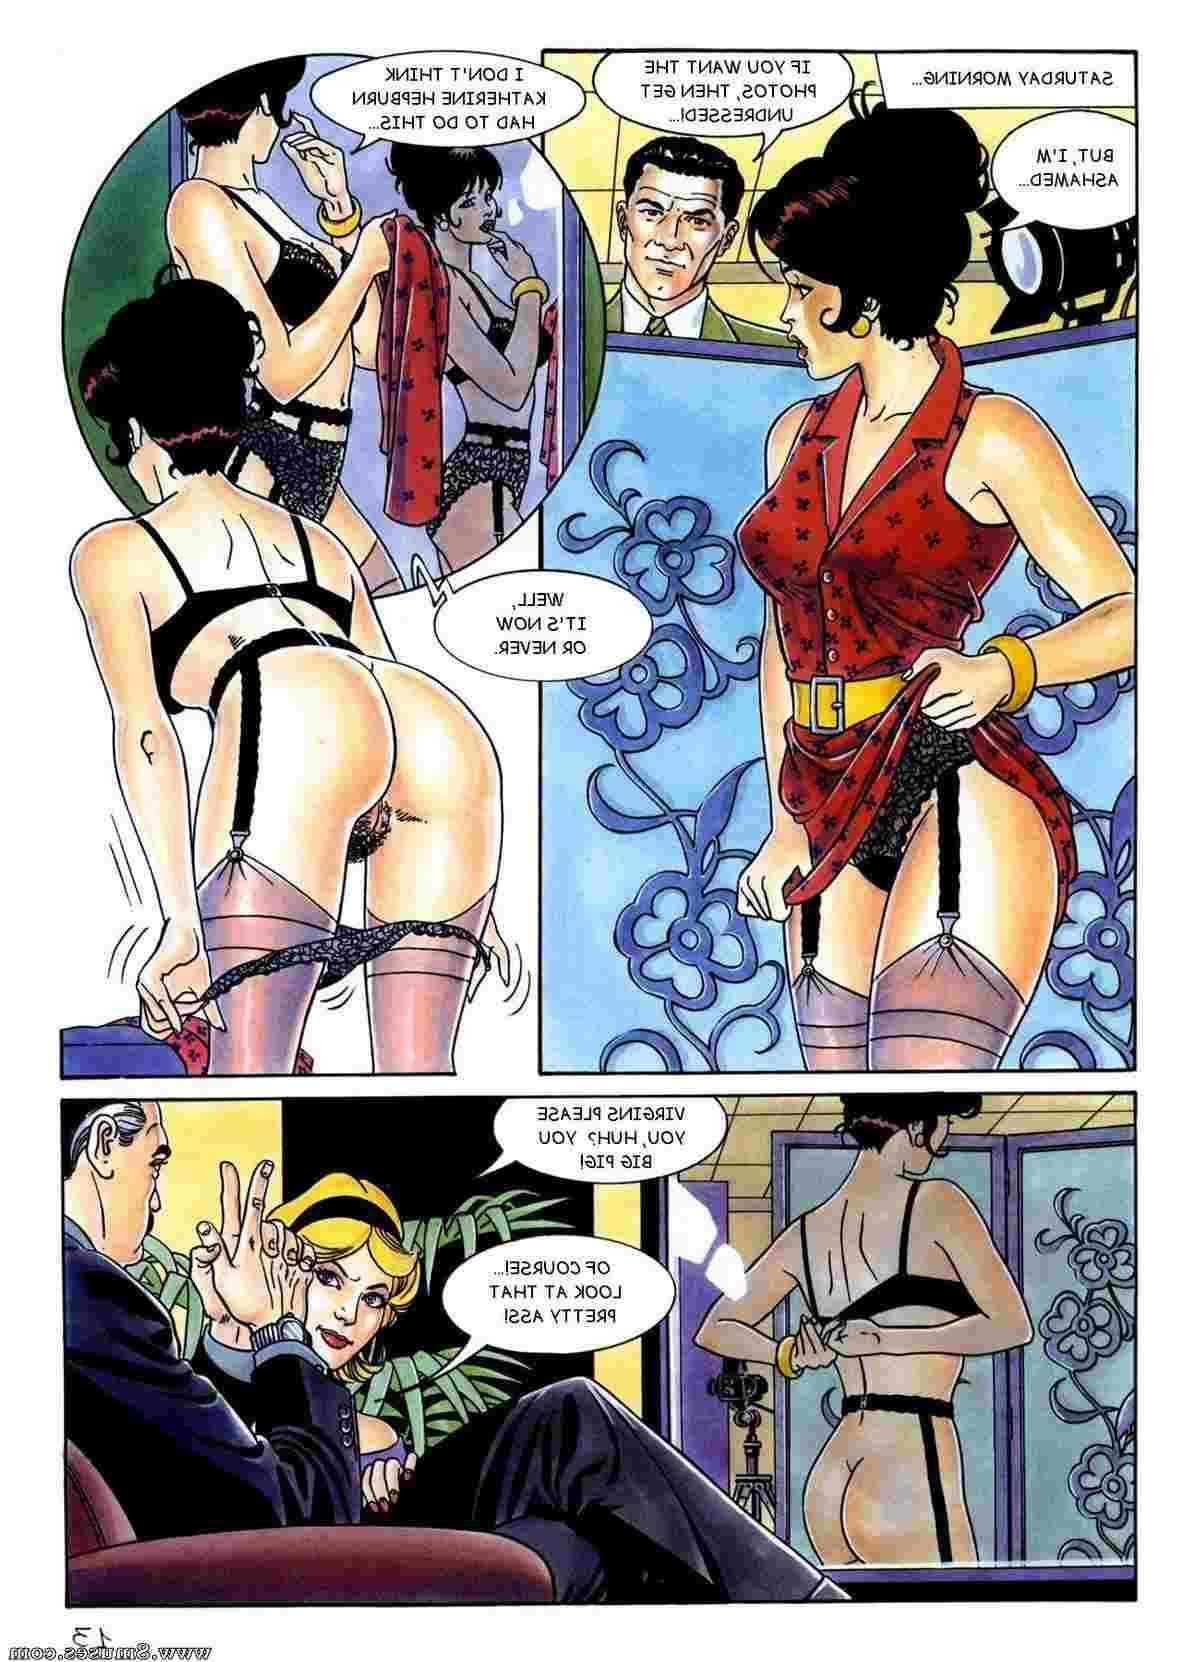 Stramaglia-Morale-Comics/Anna-Perverted-Innocence Anna_Perverted_Innocence__8muses_-_Sex_and_Porn_Comics_16.jpg